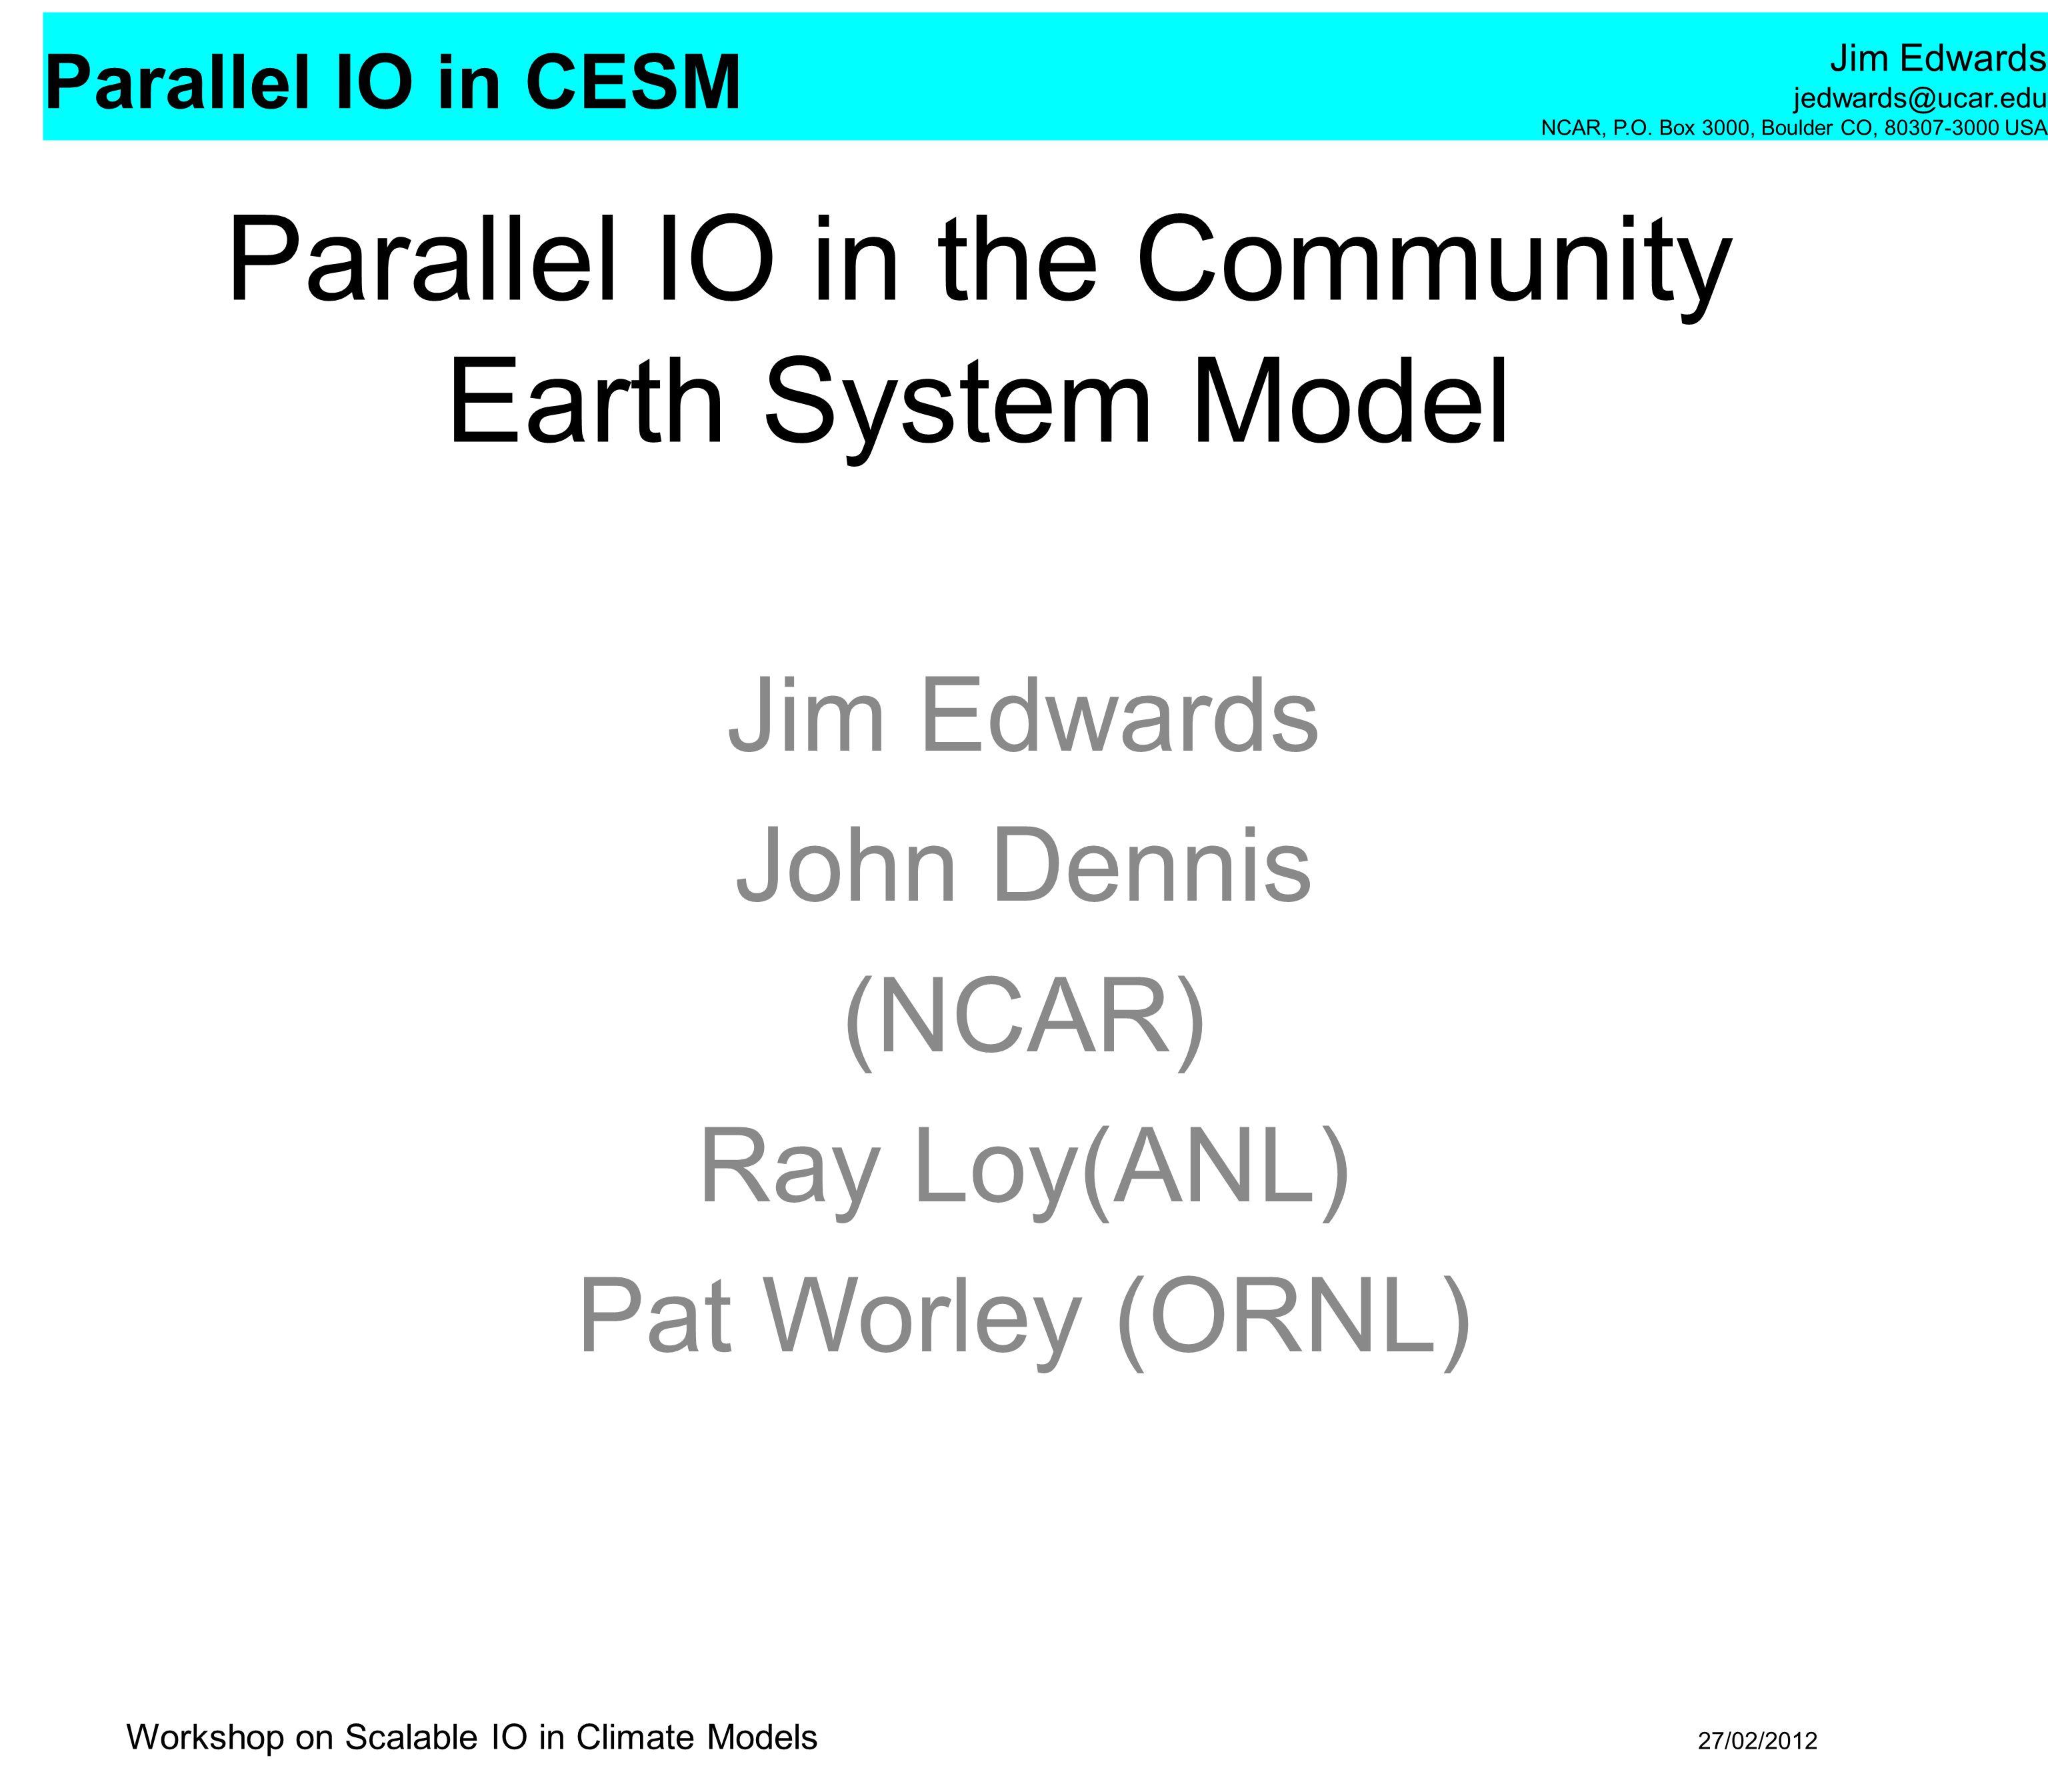 Parallel IO in CESM Jim Edwards jedwards@ucar.edu NCAR, P.O.